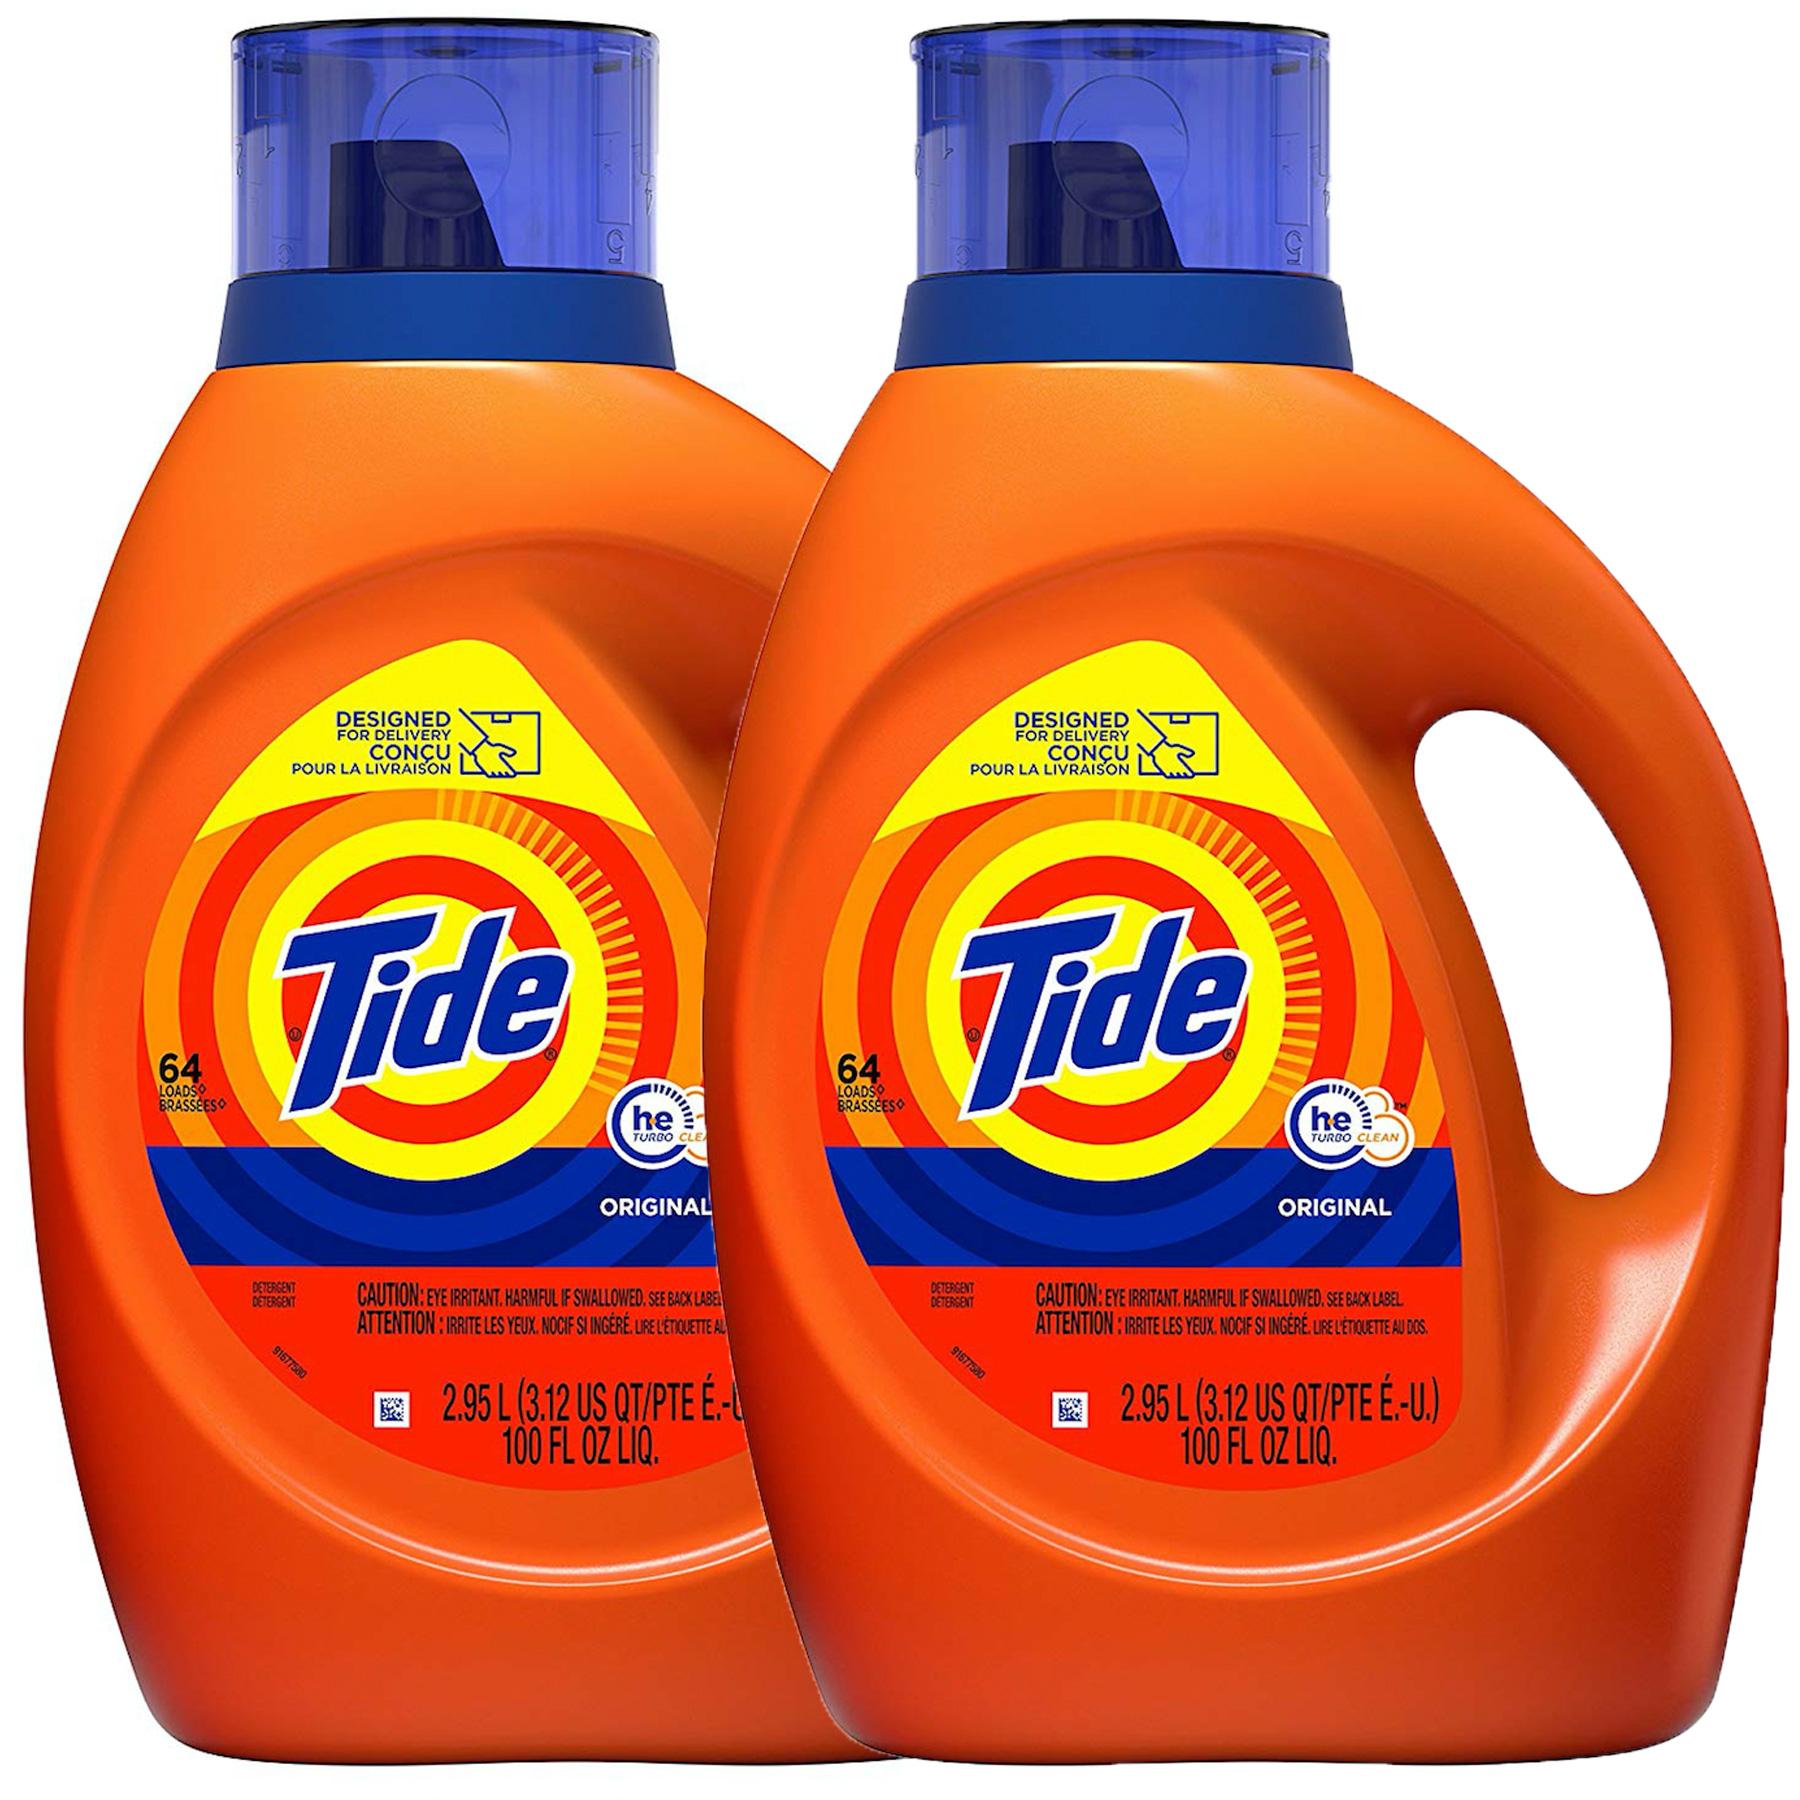 46 Off Tide Laundry Detergent Deal